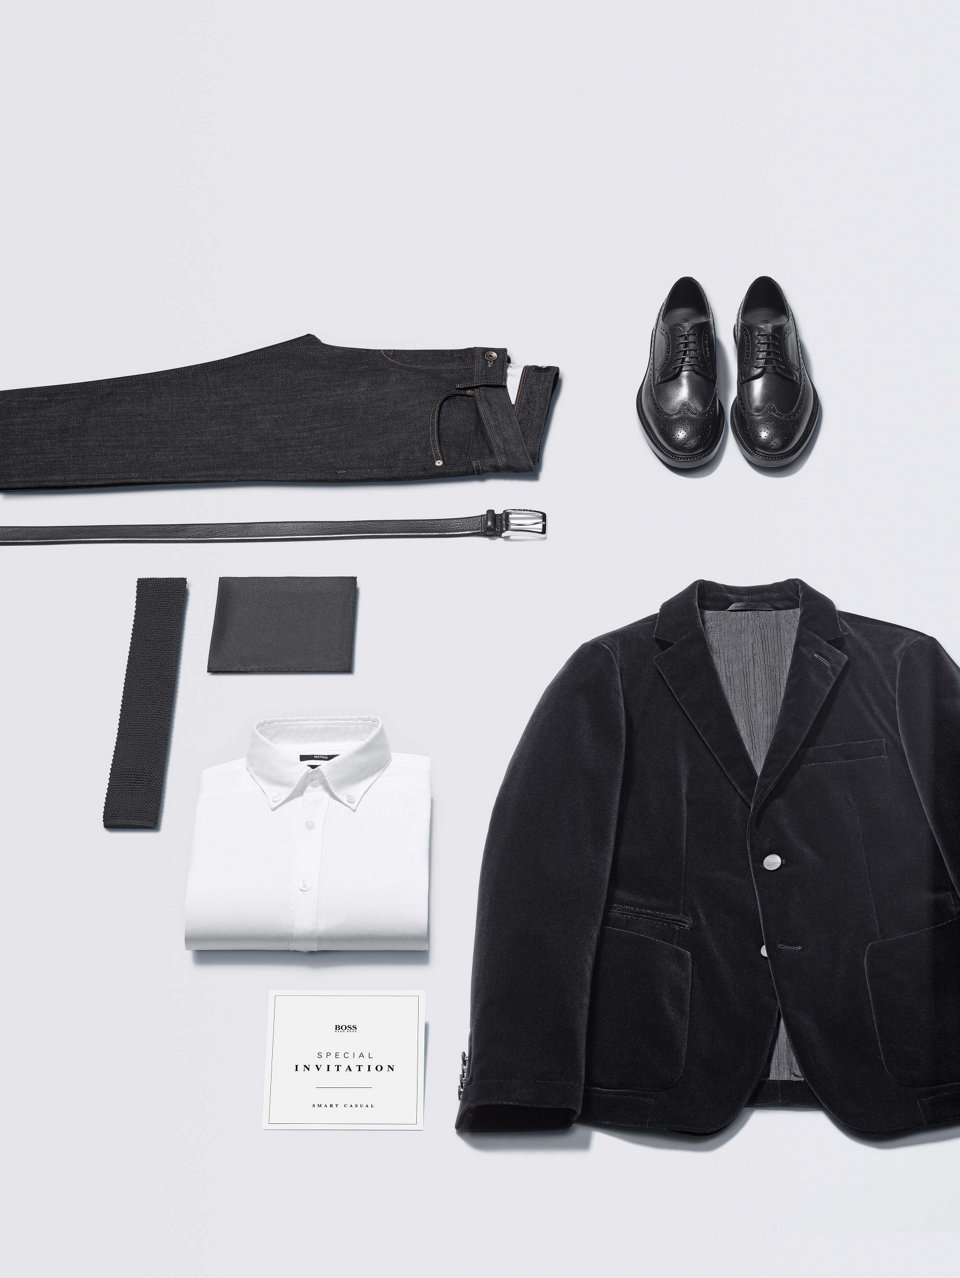 Schwarzes Hemd, schwarze Hose und schwarze Lederjacke vonBOSS